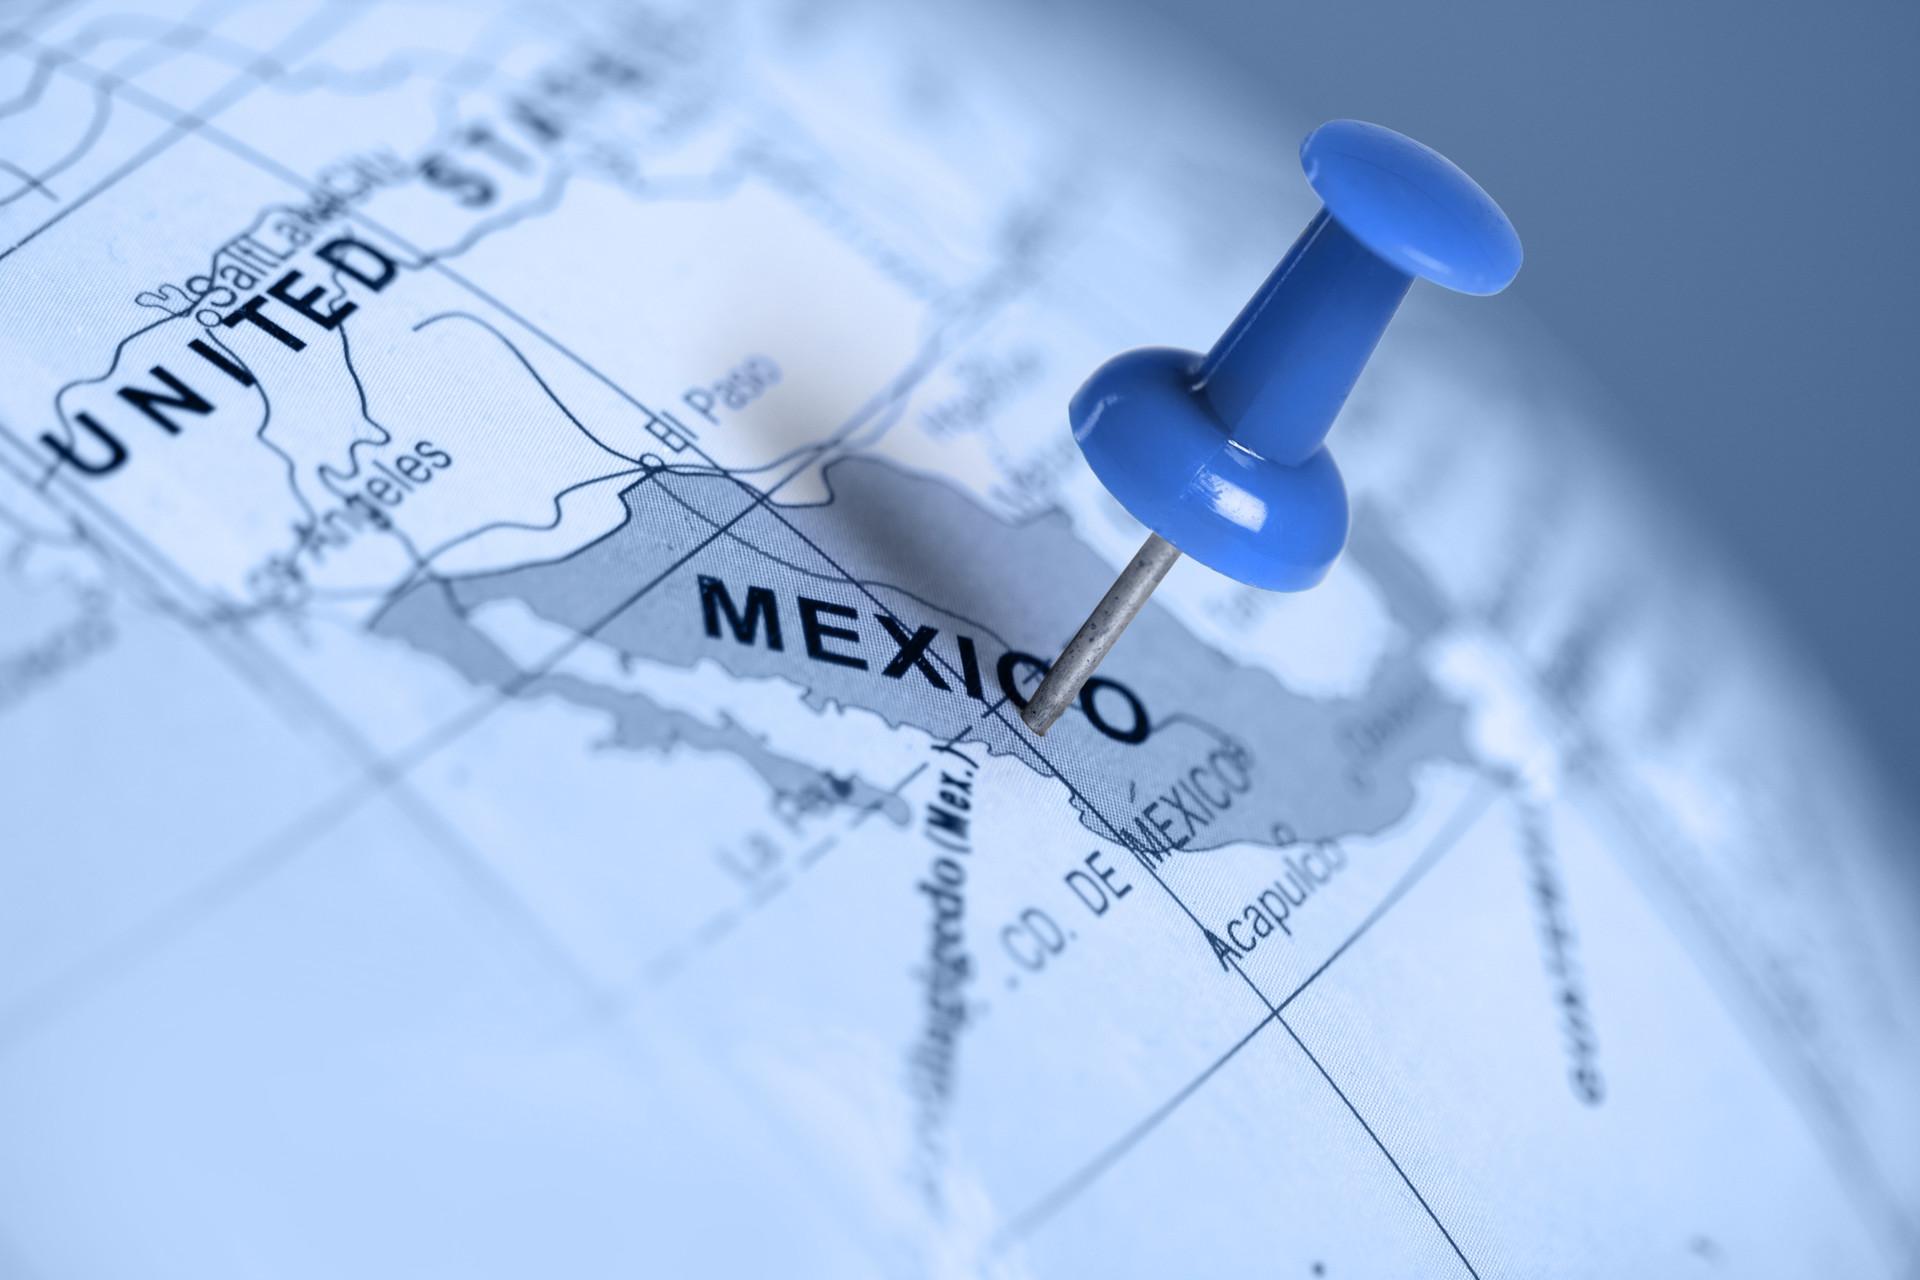 Mexico/Caribbean